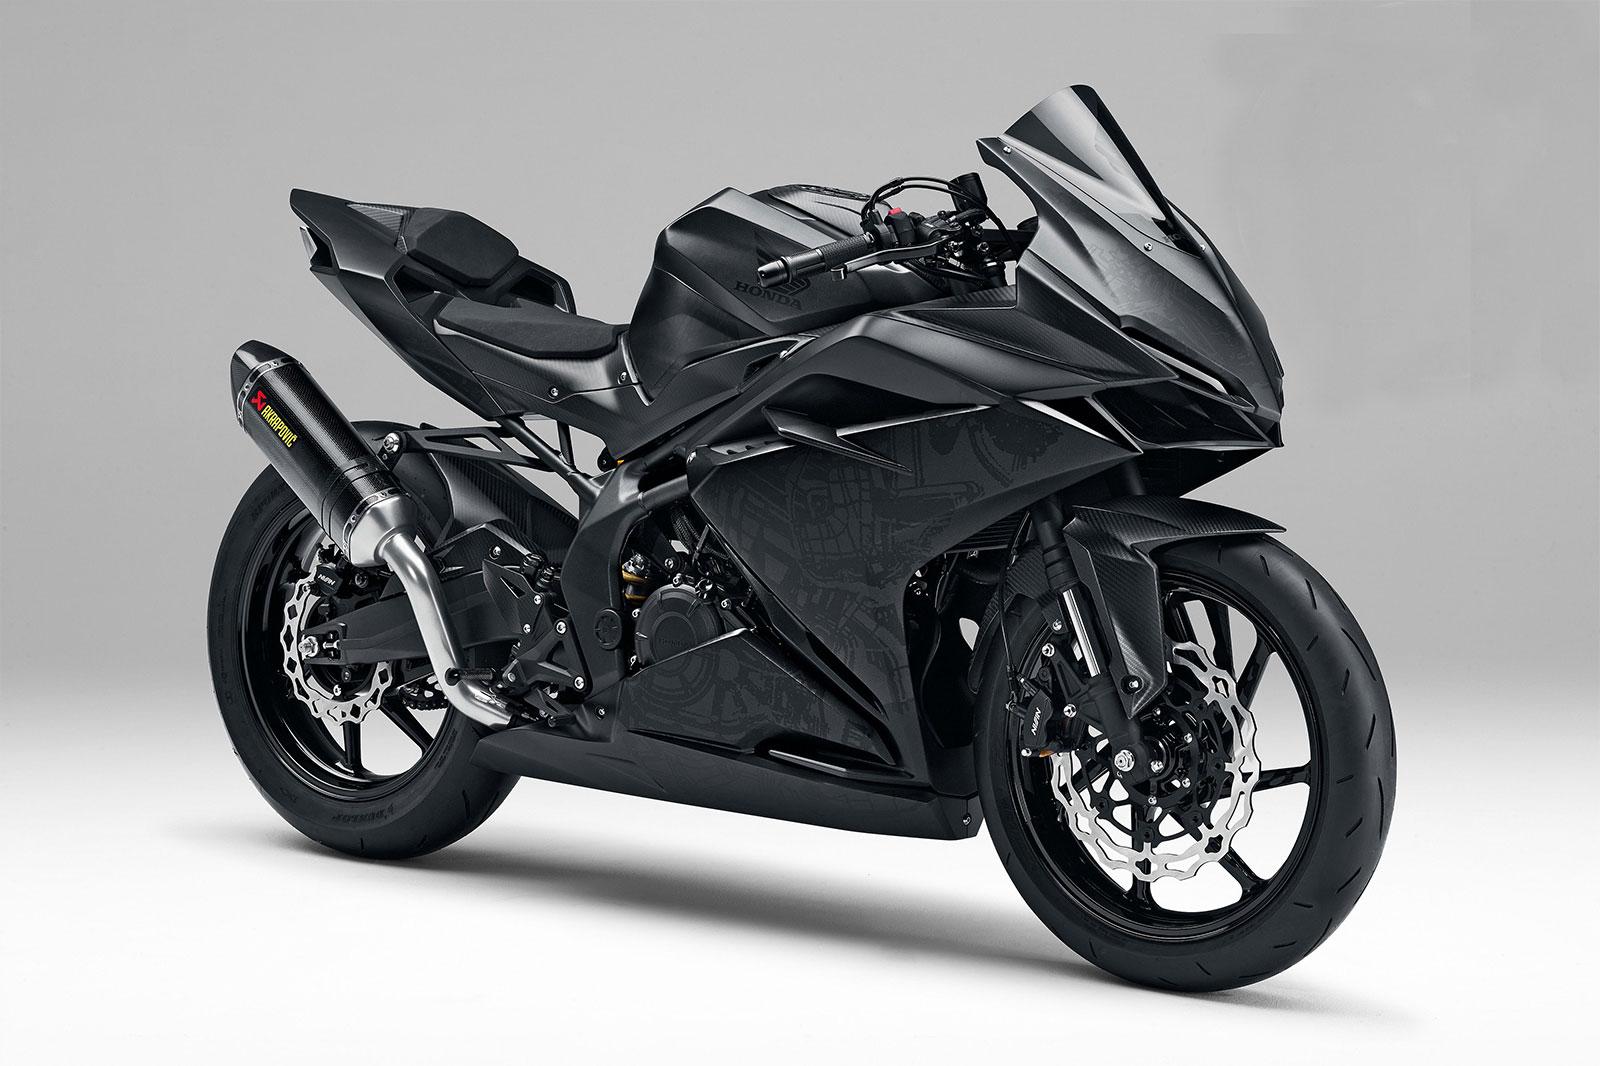 Honda CBR250RR 復活か!? これはかっこいい!!